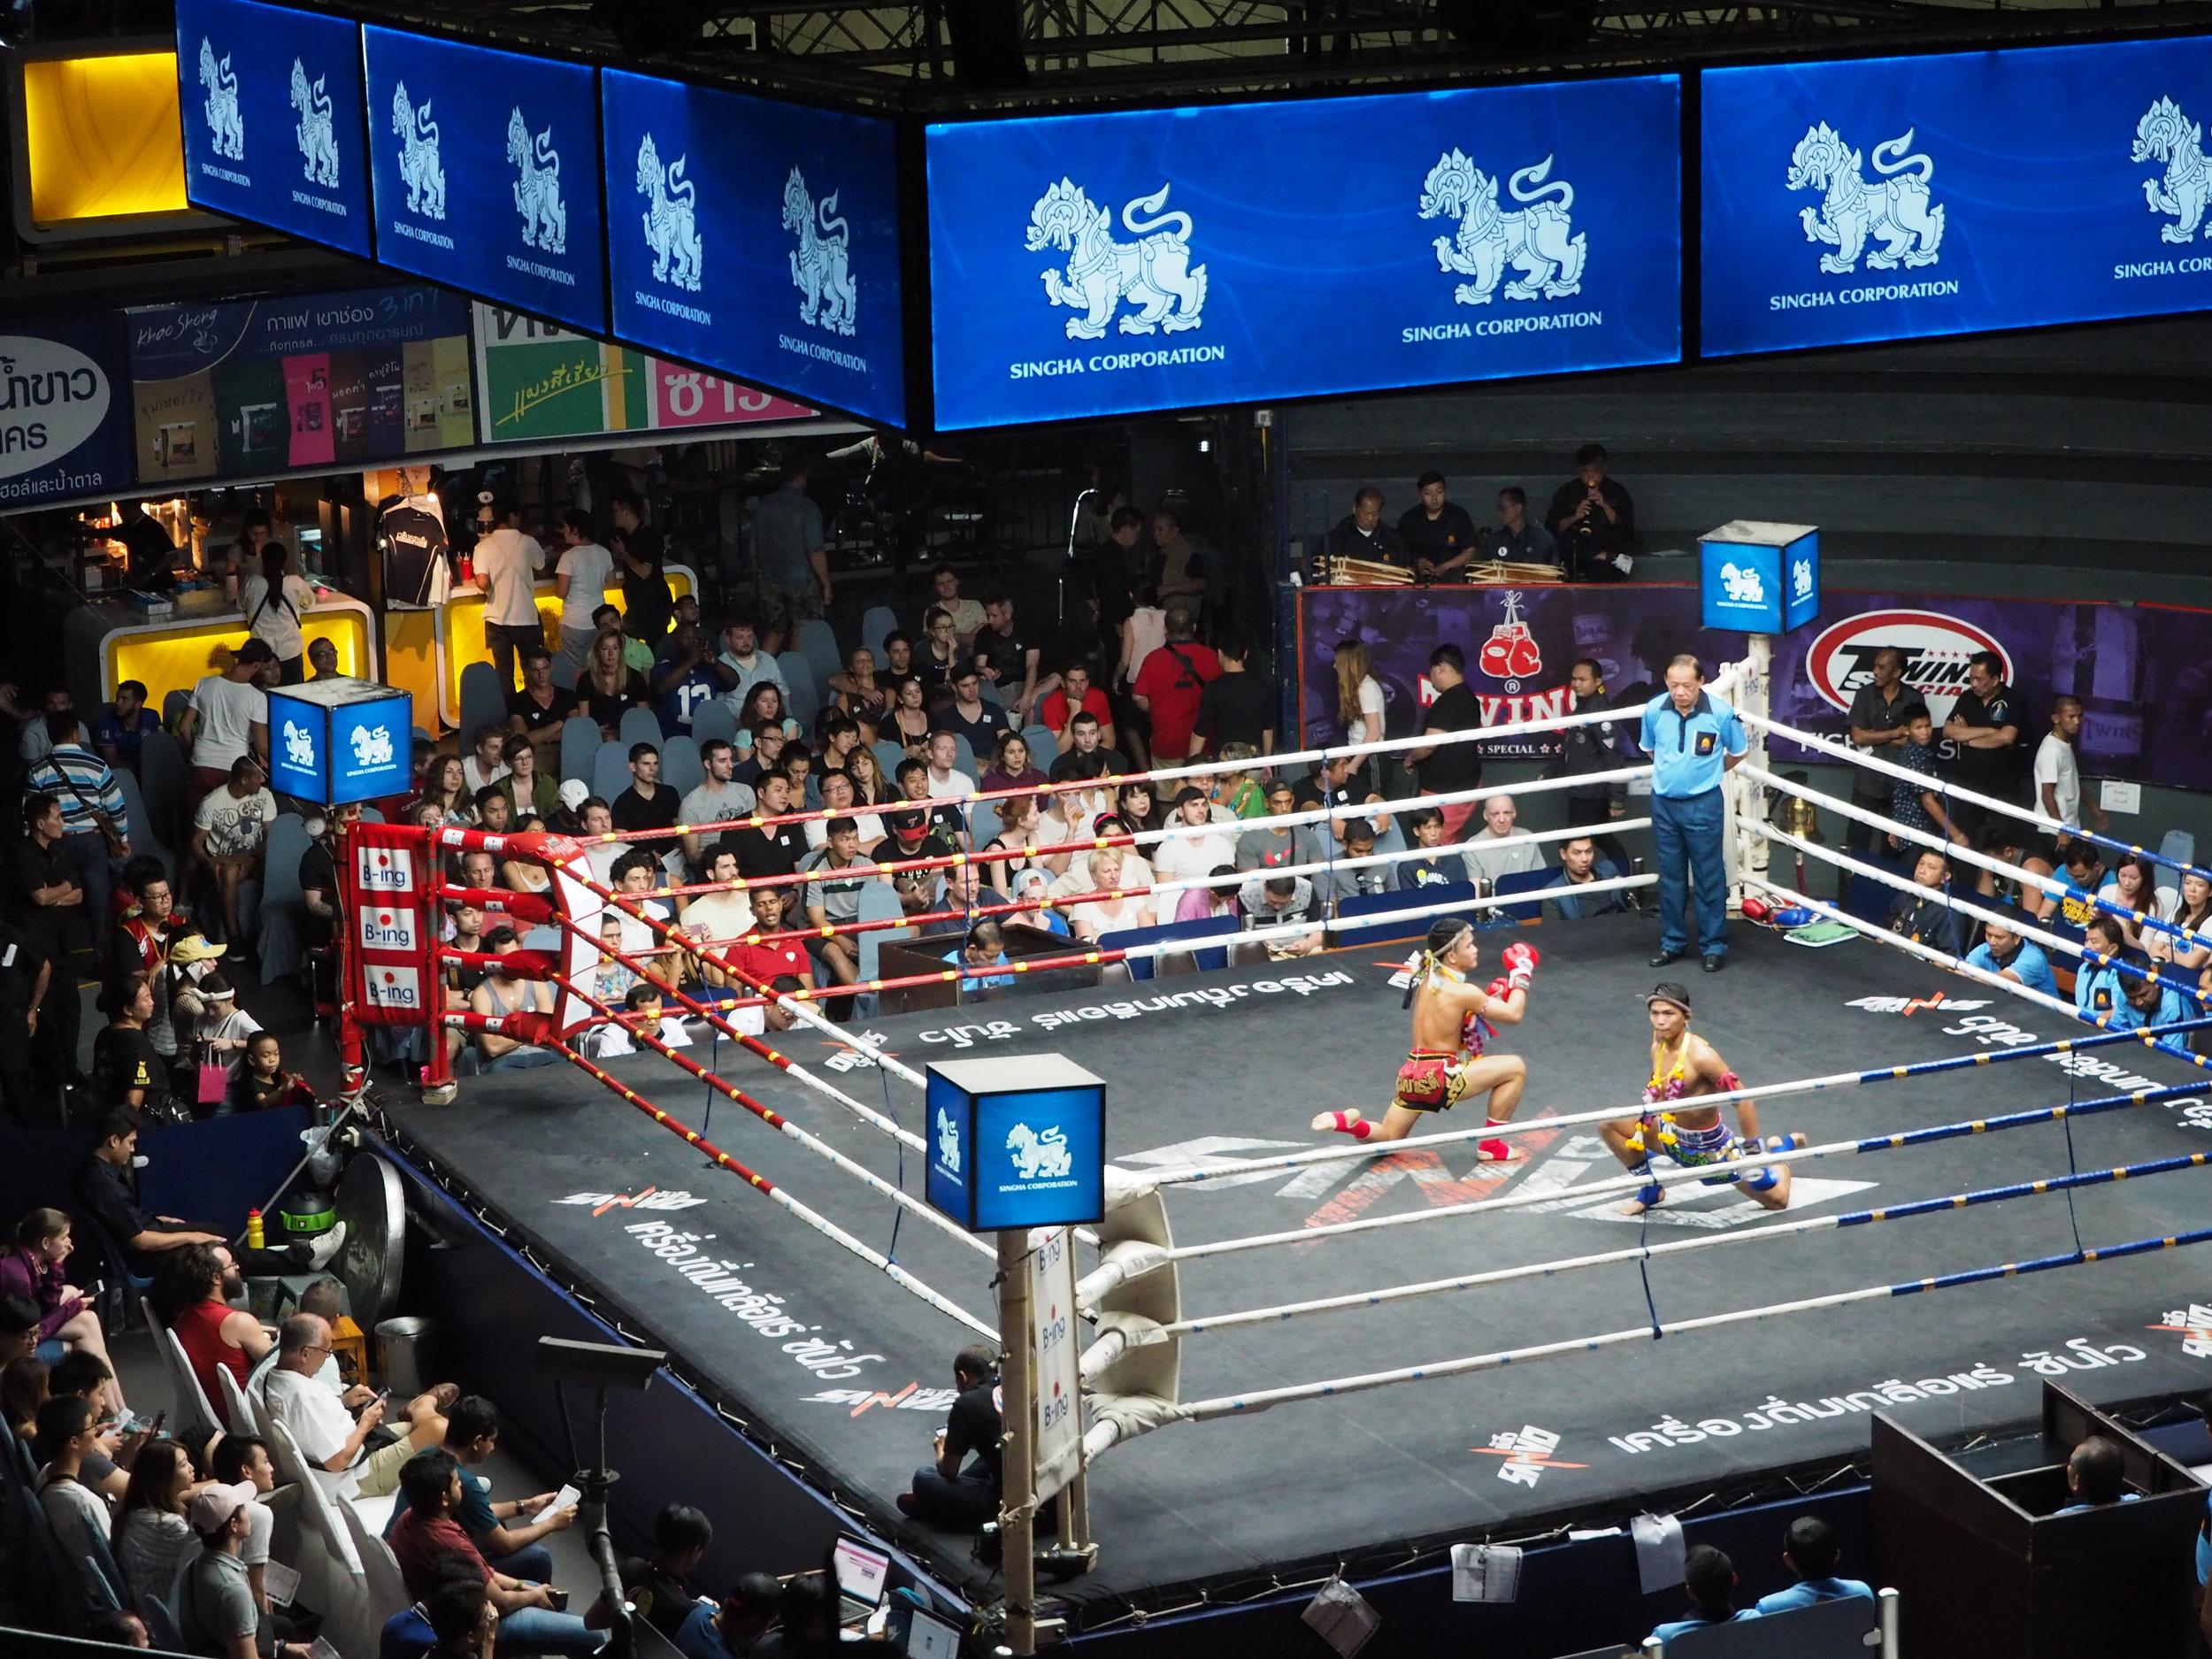 Two fighters preparing for battle, going through the wai kru ram muay ritual at the prestigious Rajadamnern stadium